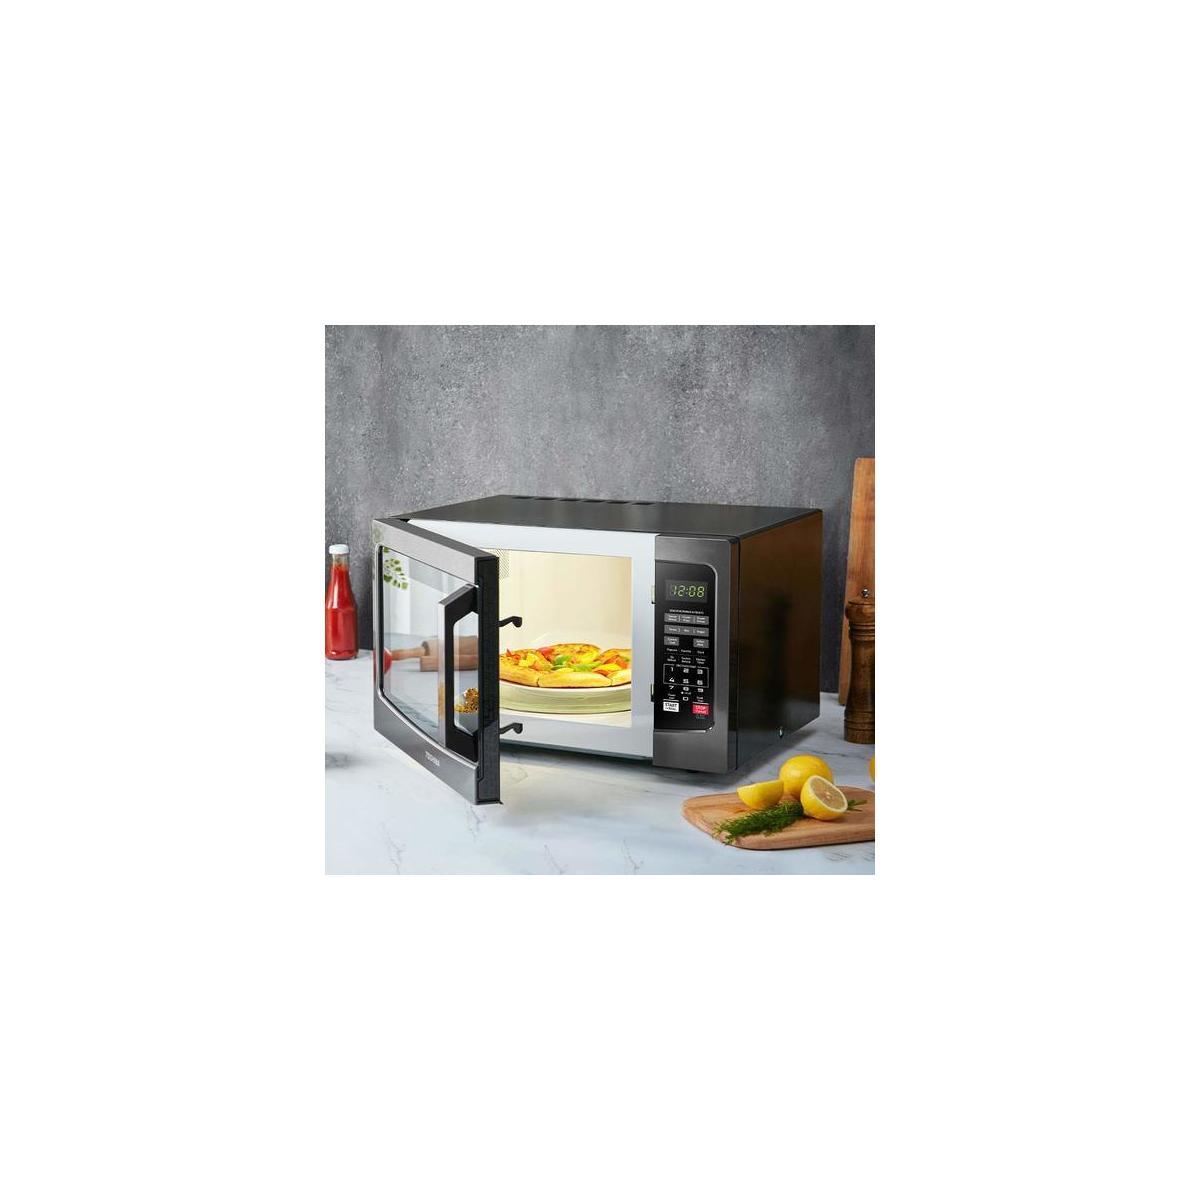 Toshiba Em131a5c Bs Microwave Oven With Smart Sensor Easy ...